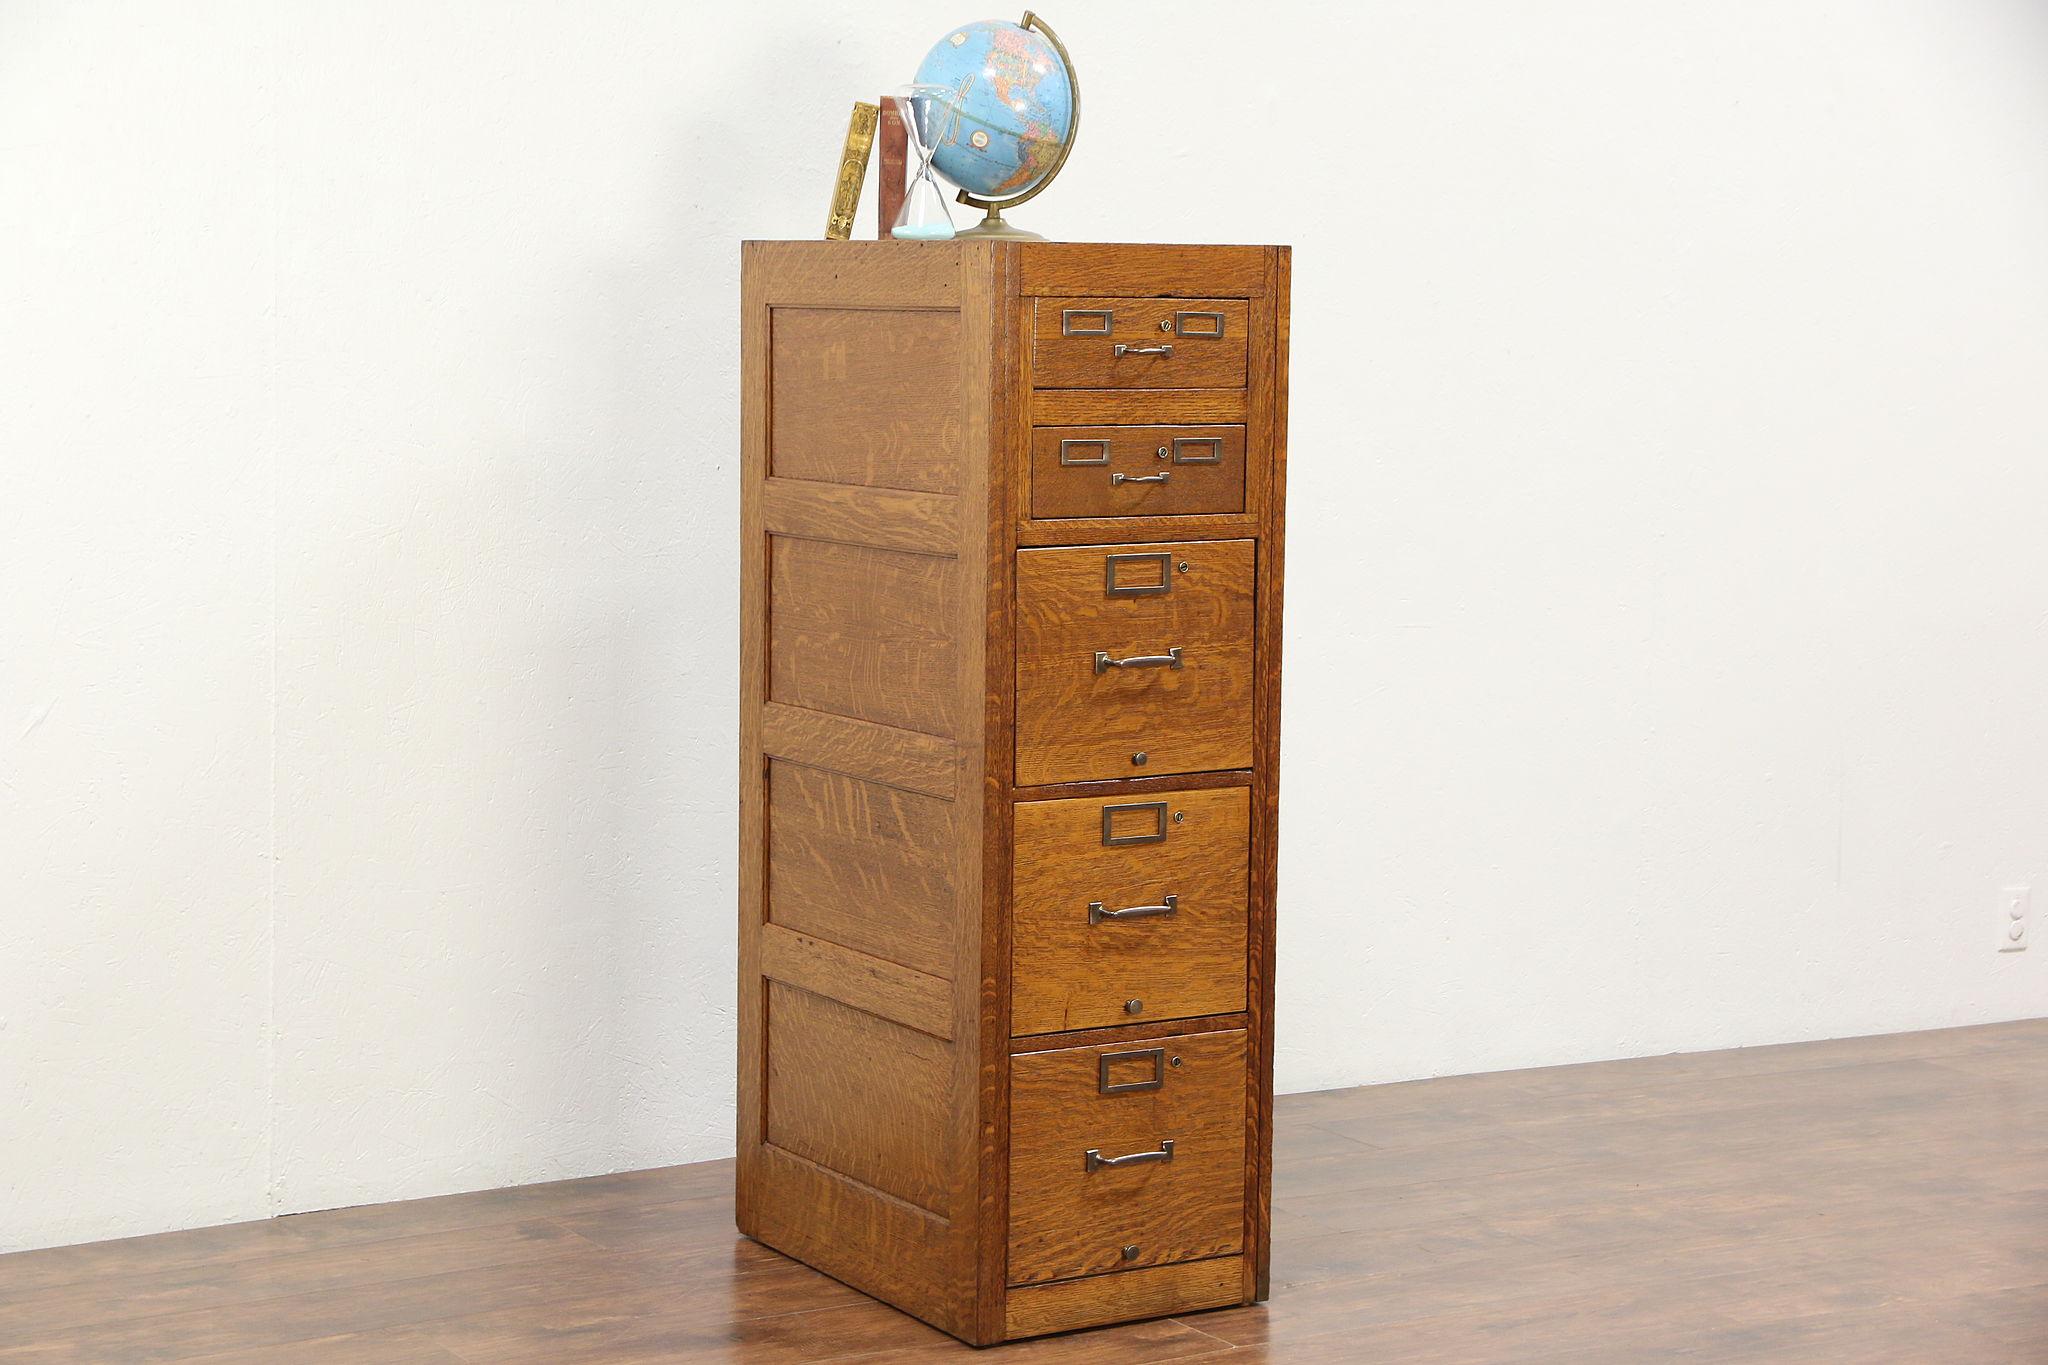 Oak 1930u0027s 5 Drawer Filing Cabinet, Letter U0026 3x5 Card Sizes ...